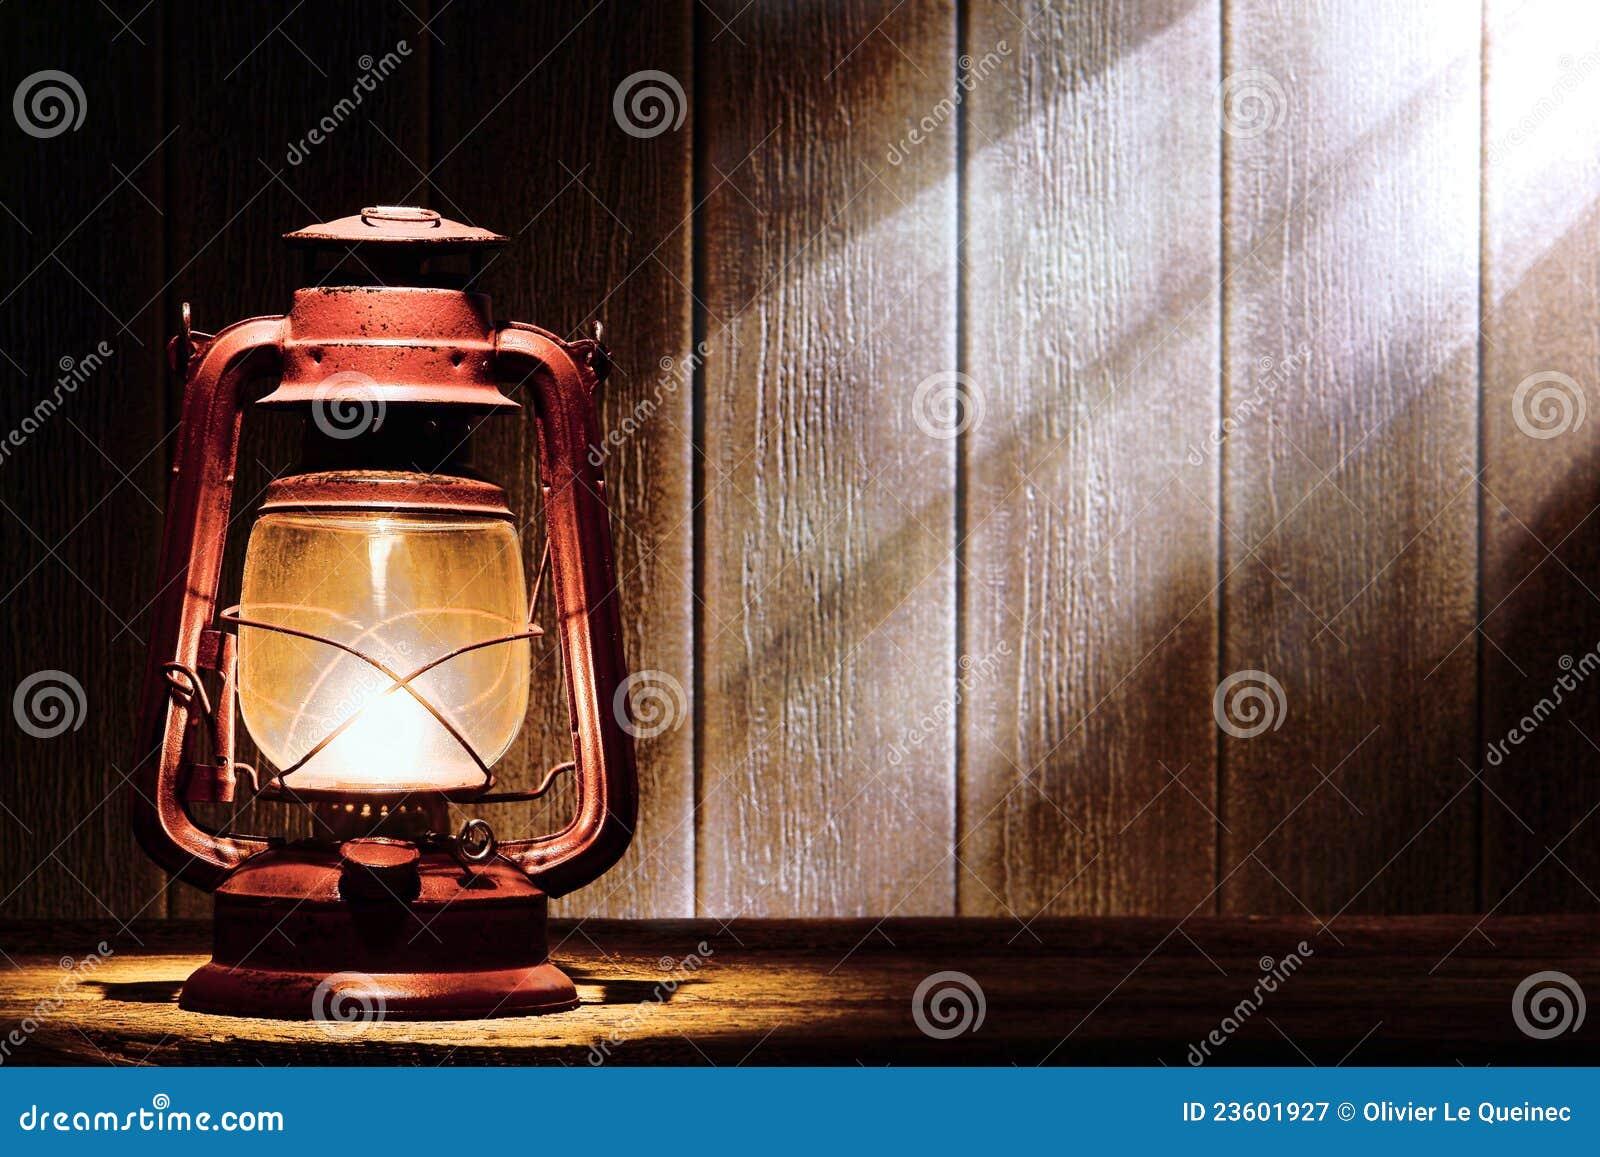 Old Kerosene Lantern Lamp In Rustic Country Barn Stock ...